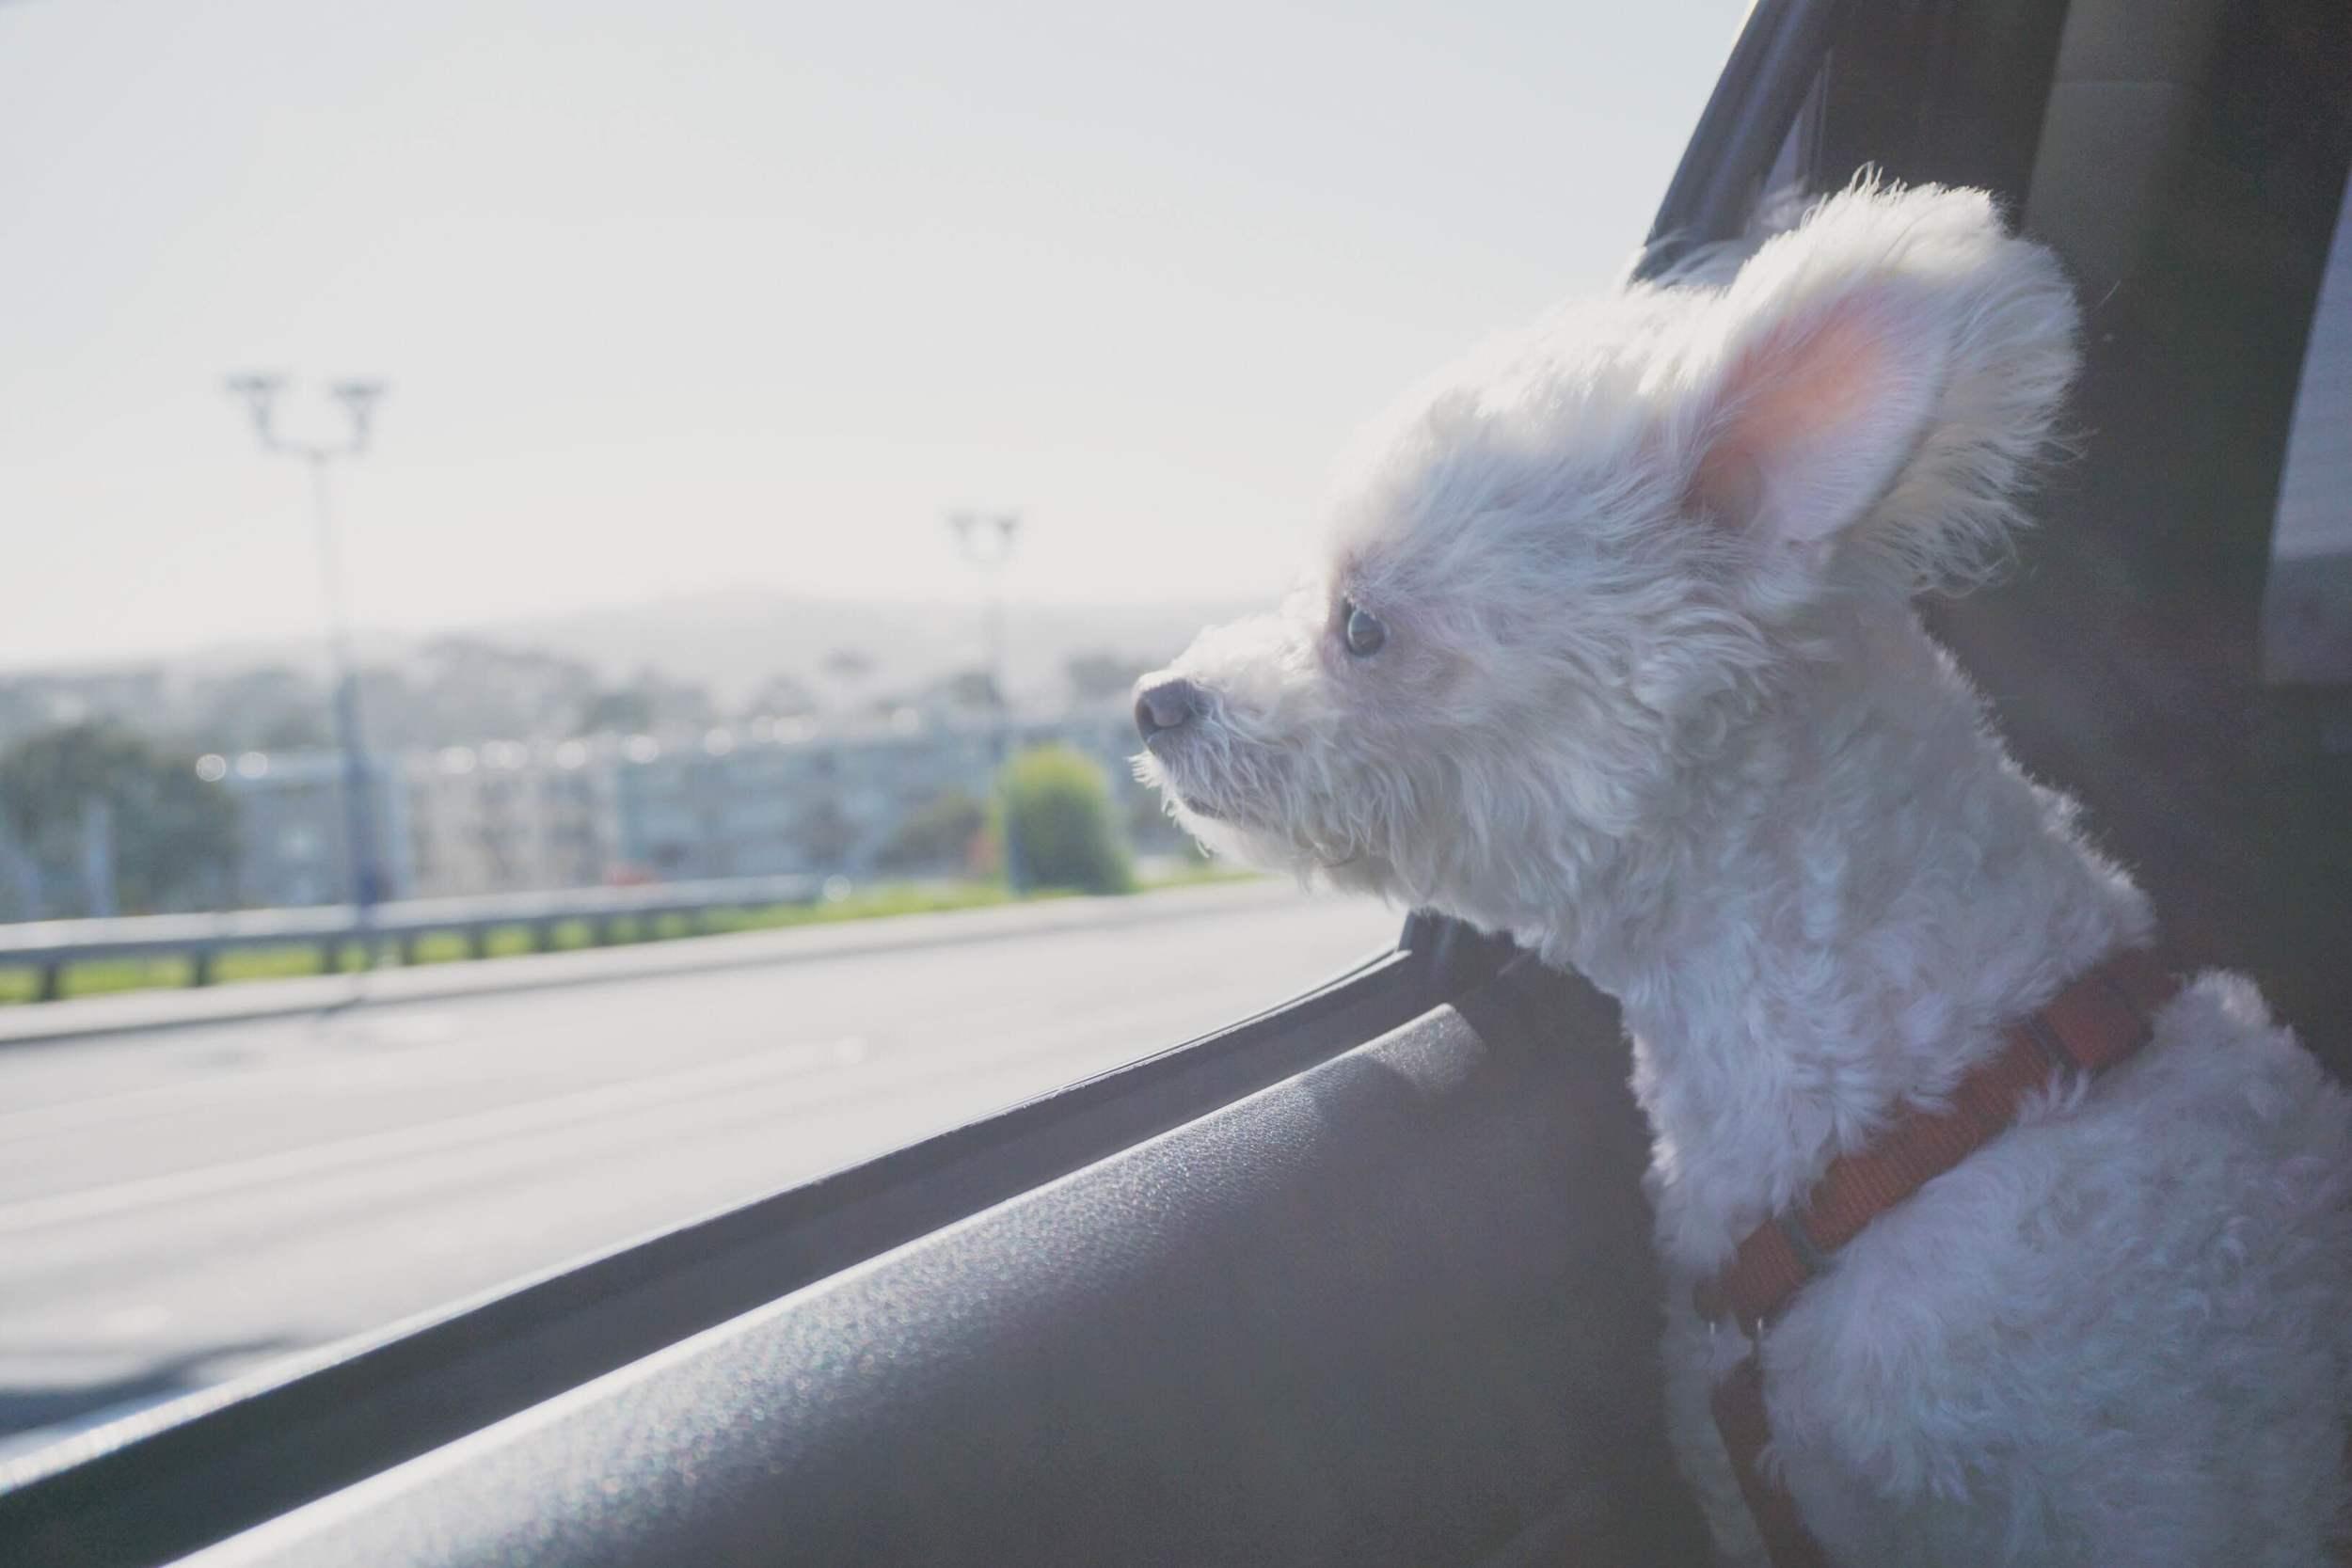 Yoshi loving the car ride to Chico.